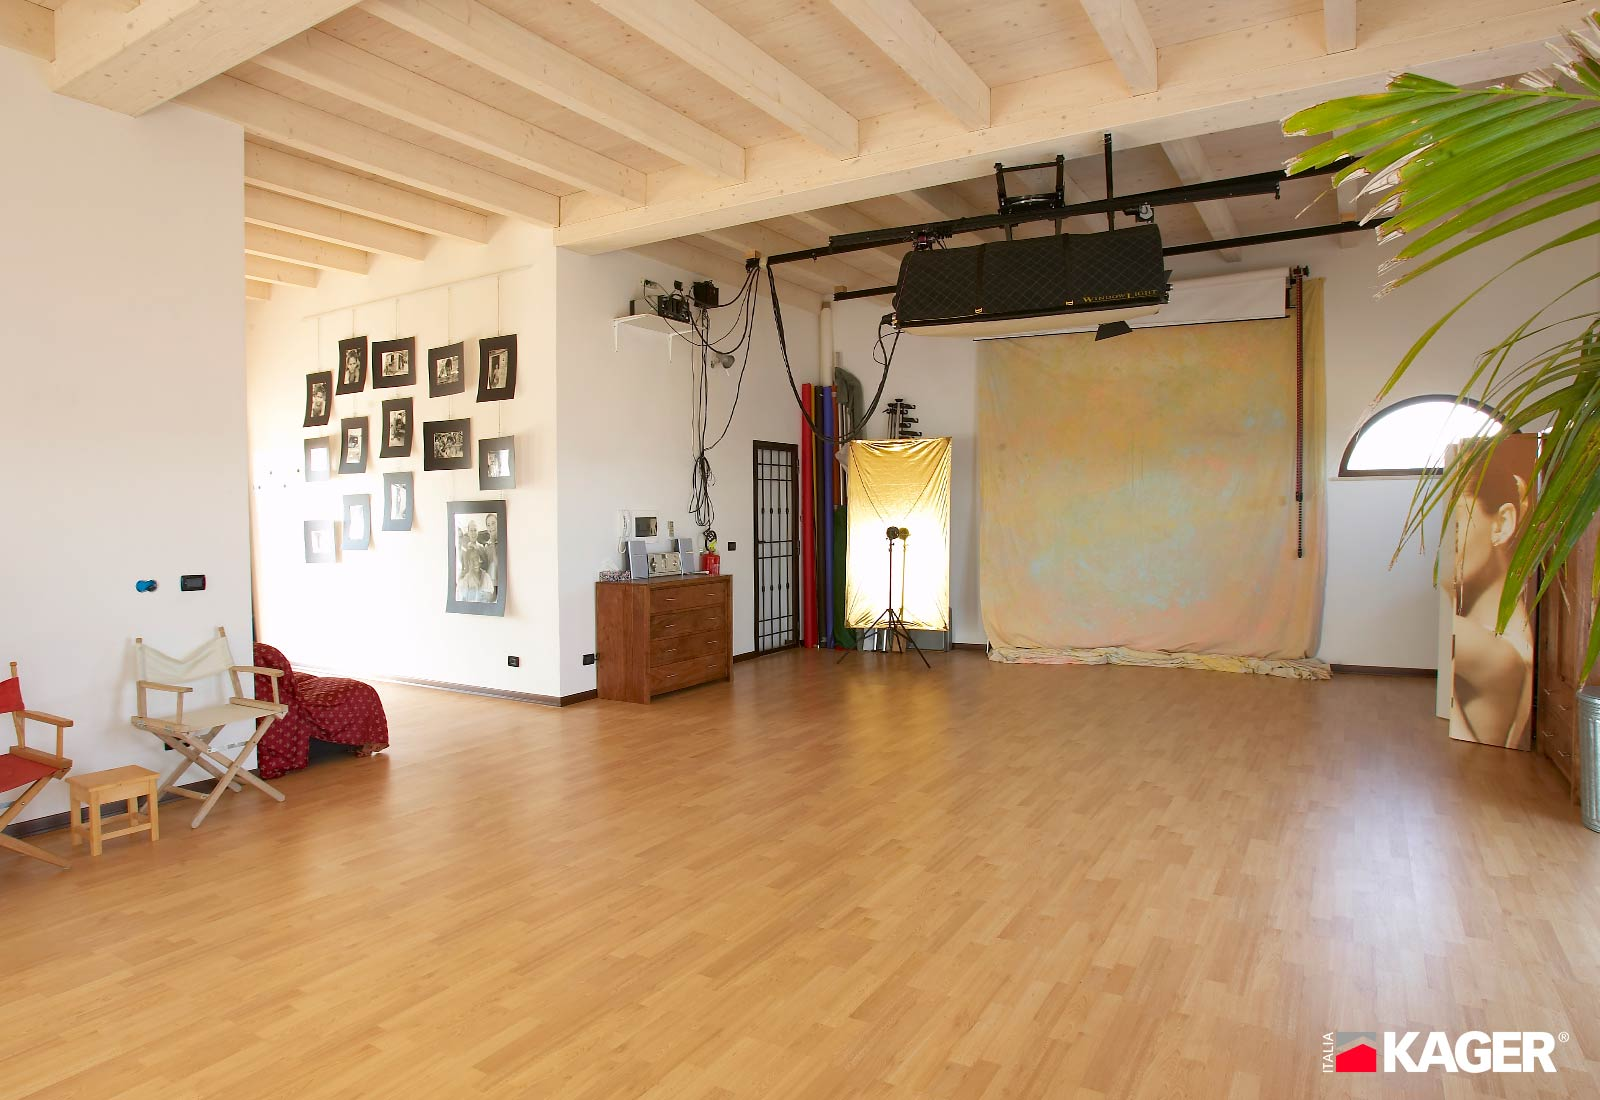 Casa-in-legno-Ferrara-Kager-Italia-13